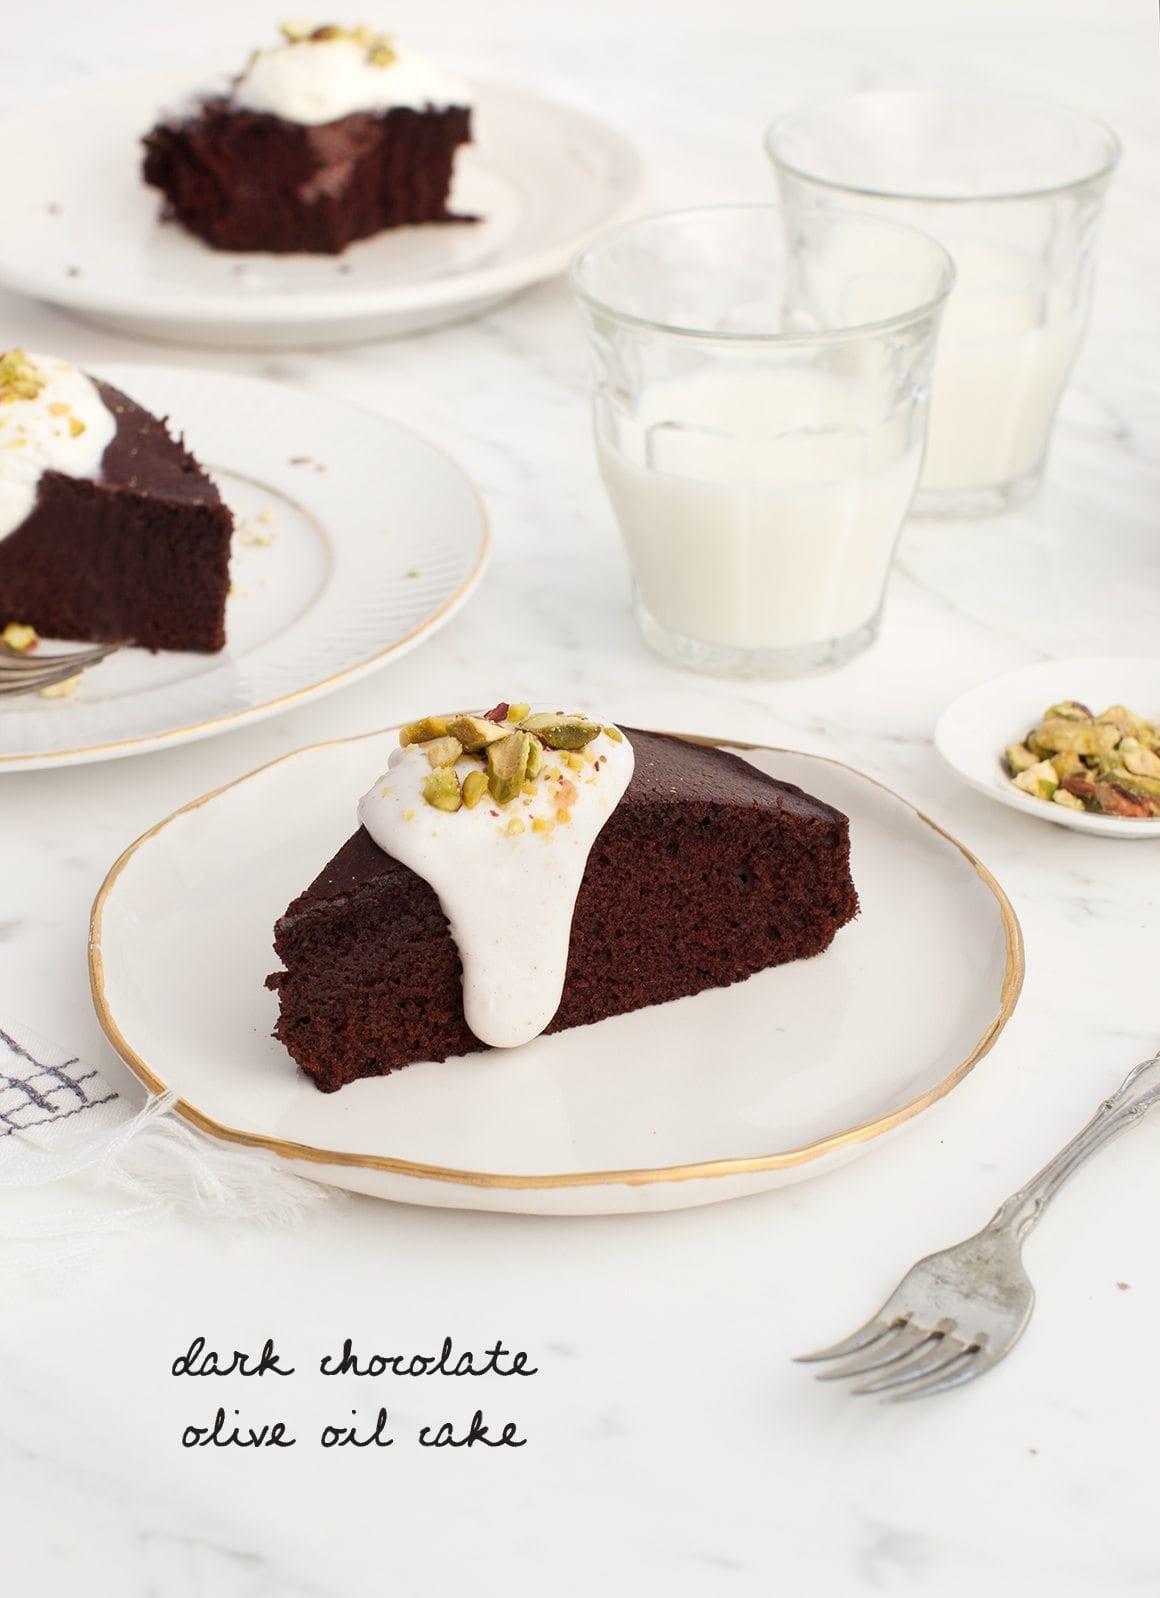 Chocolate Olive Oil Cake  Dark Chocolate Olive Oil Cake Recipe Love and Lemons